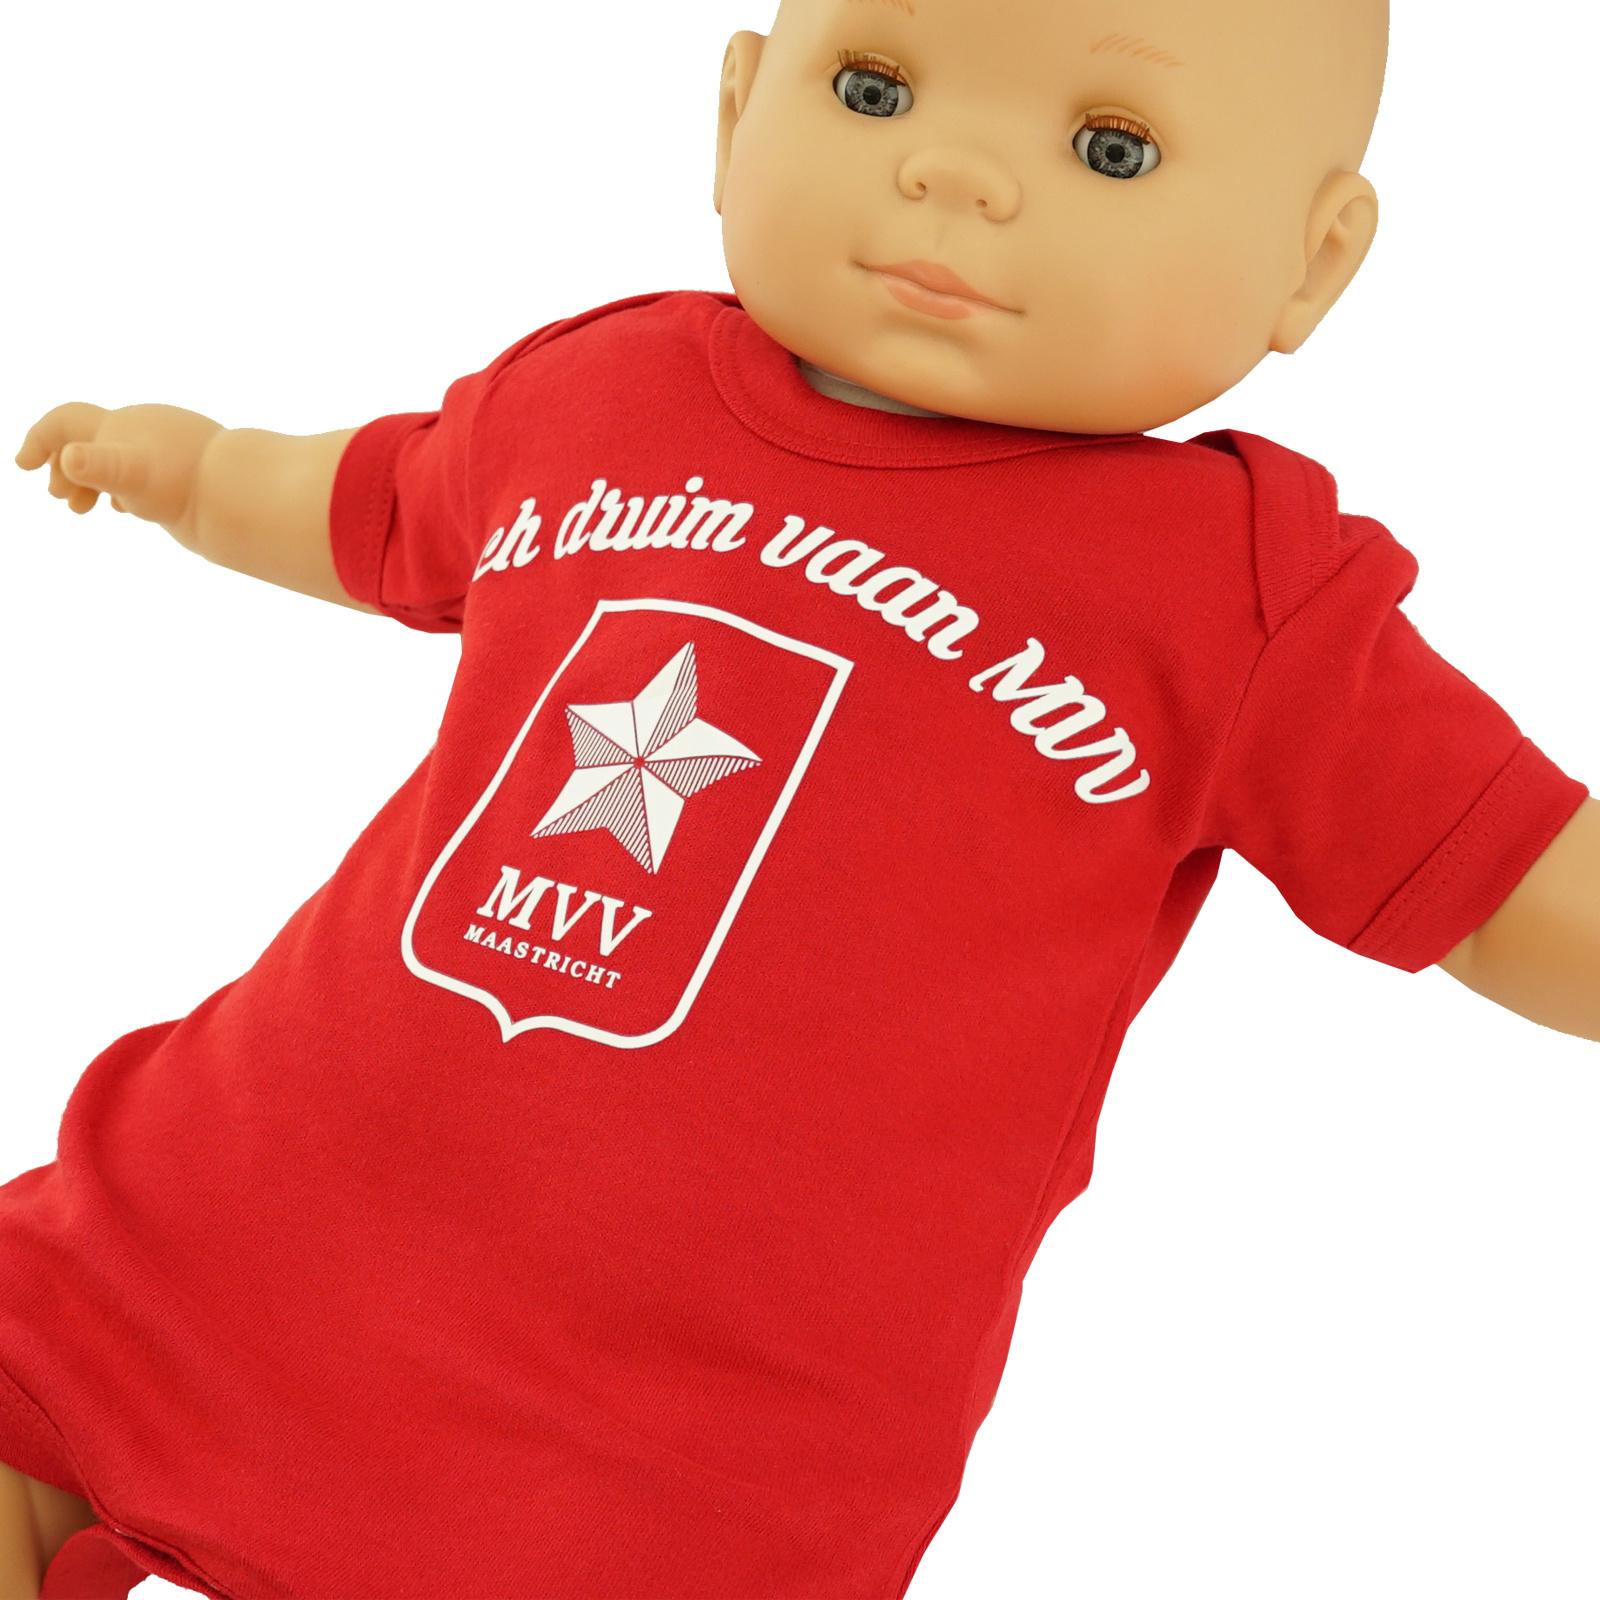 Baby body - rood - Iech druum vaan MVV